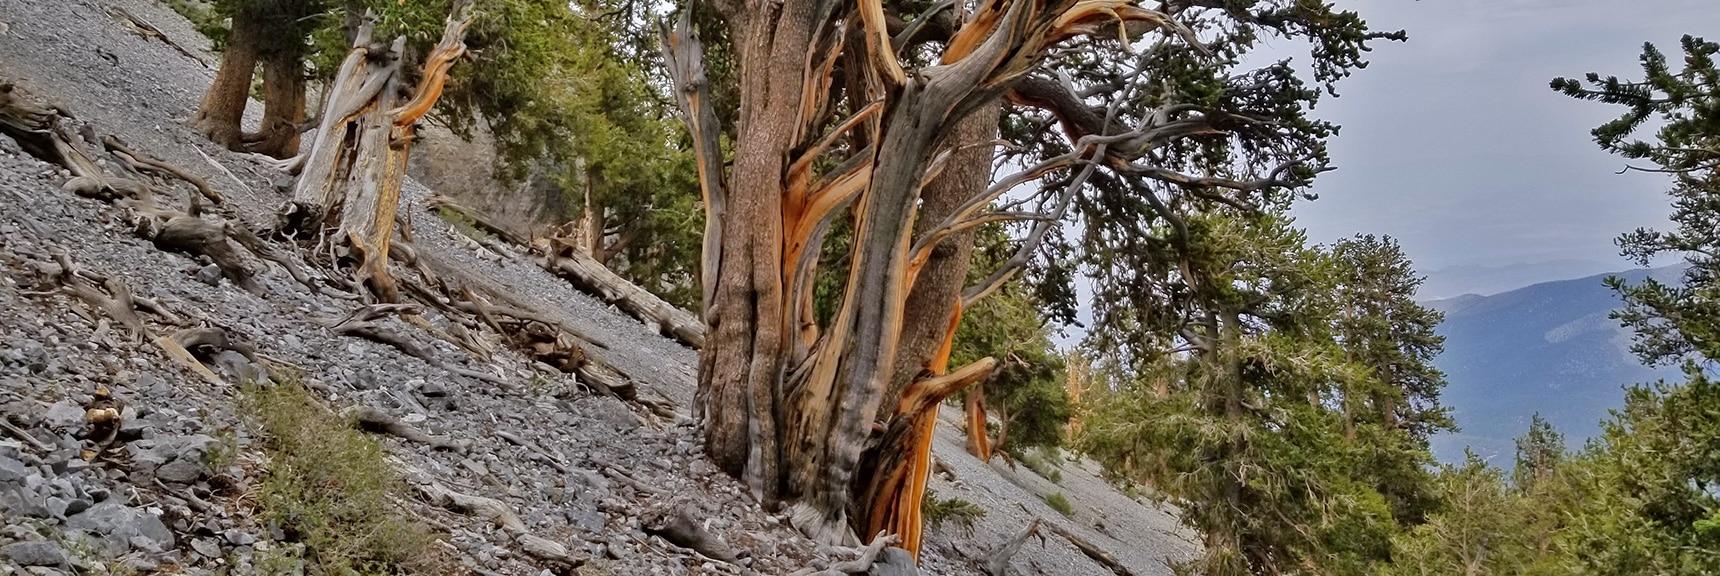 Impressive Ancient Bristlecone Pines Growing on the Avalanche Slope Below the NE Cliff Descent Chute. | Mummy Mountain NE Cliffs Descent | Mt Charleston Wilderness | Spring Mountains, Nevada